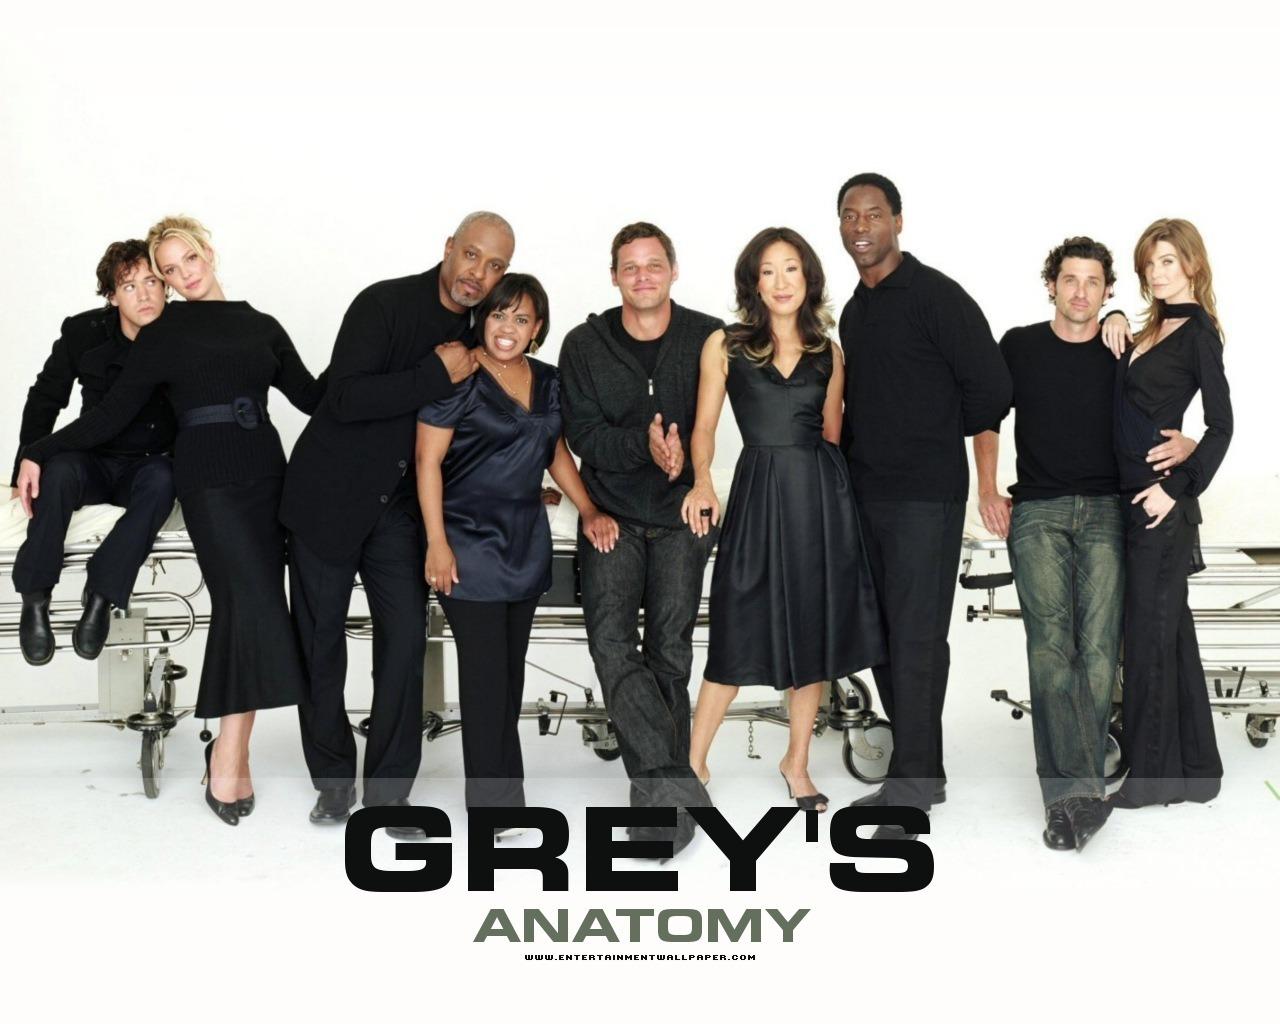 Greys Anatomy (TV Series 2005) Full Movie Online Free